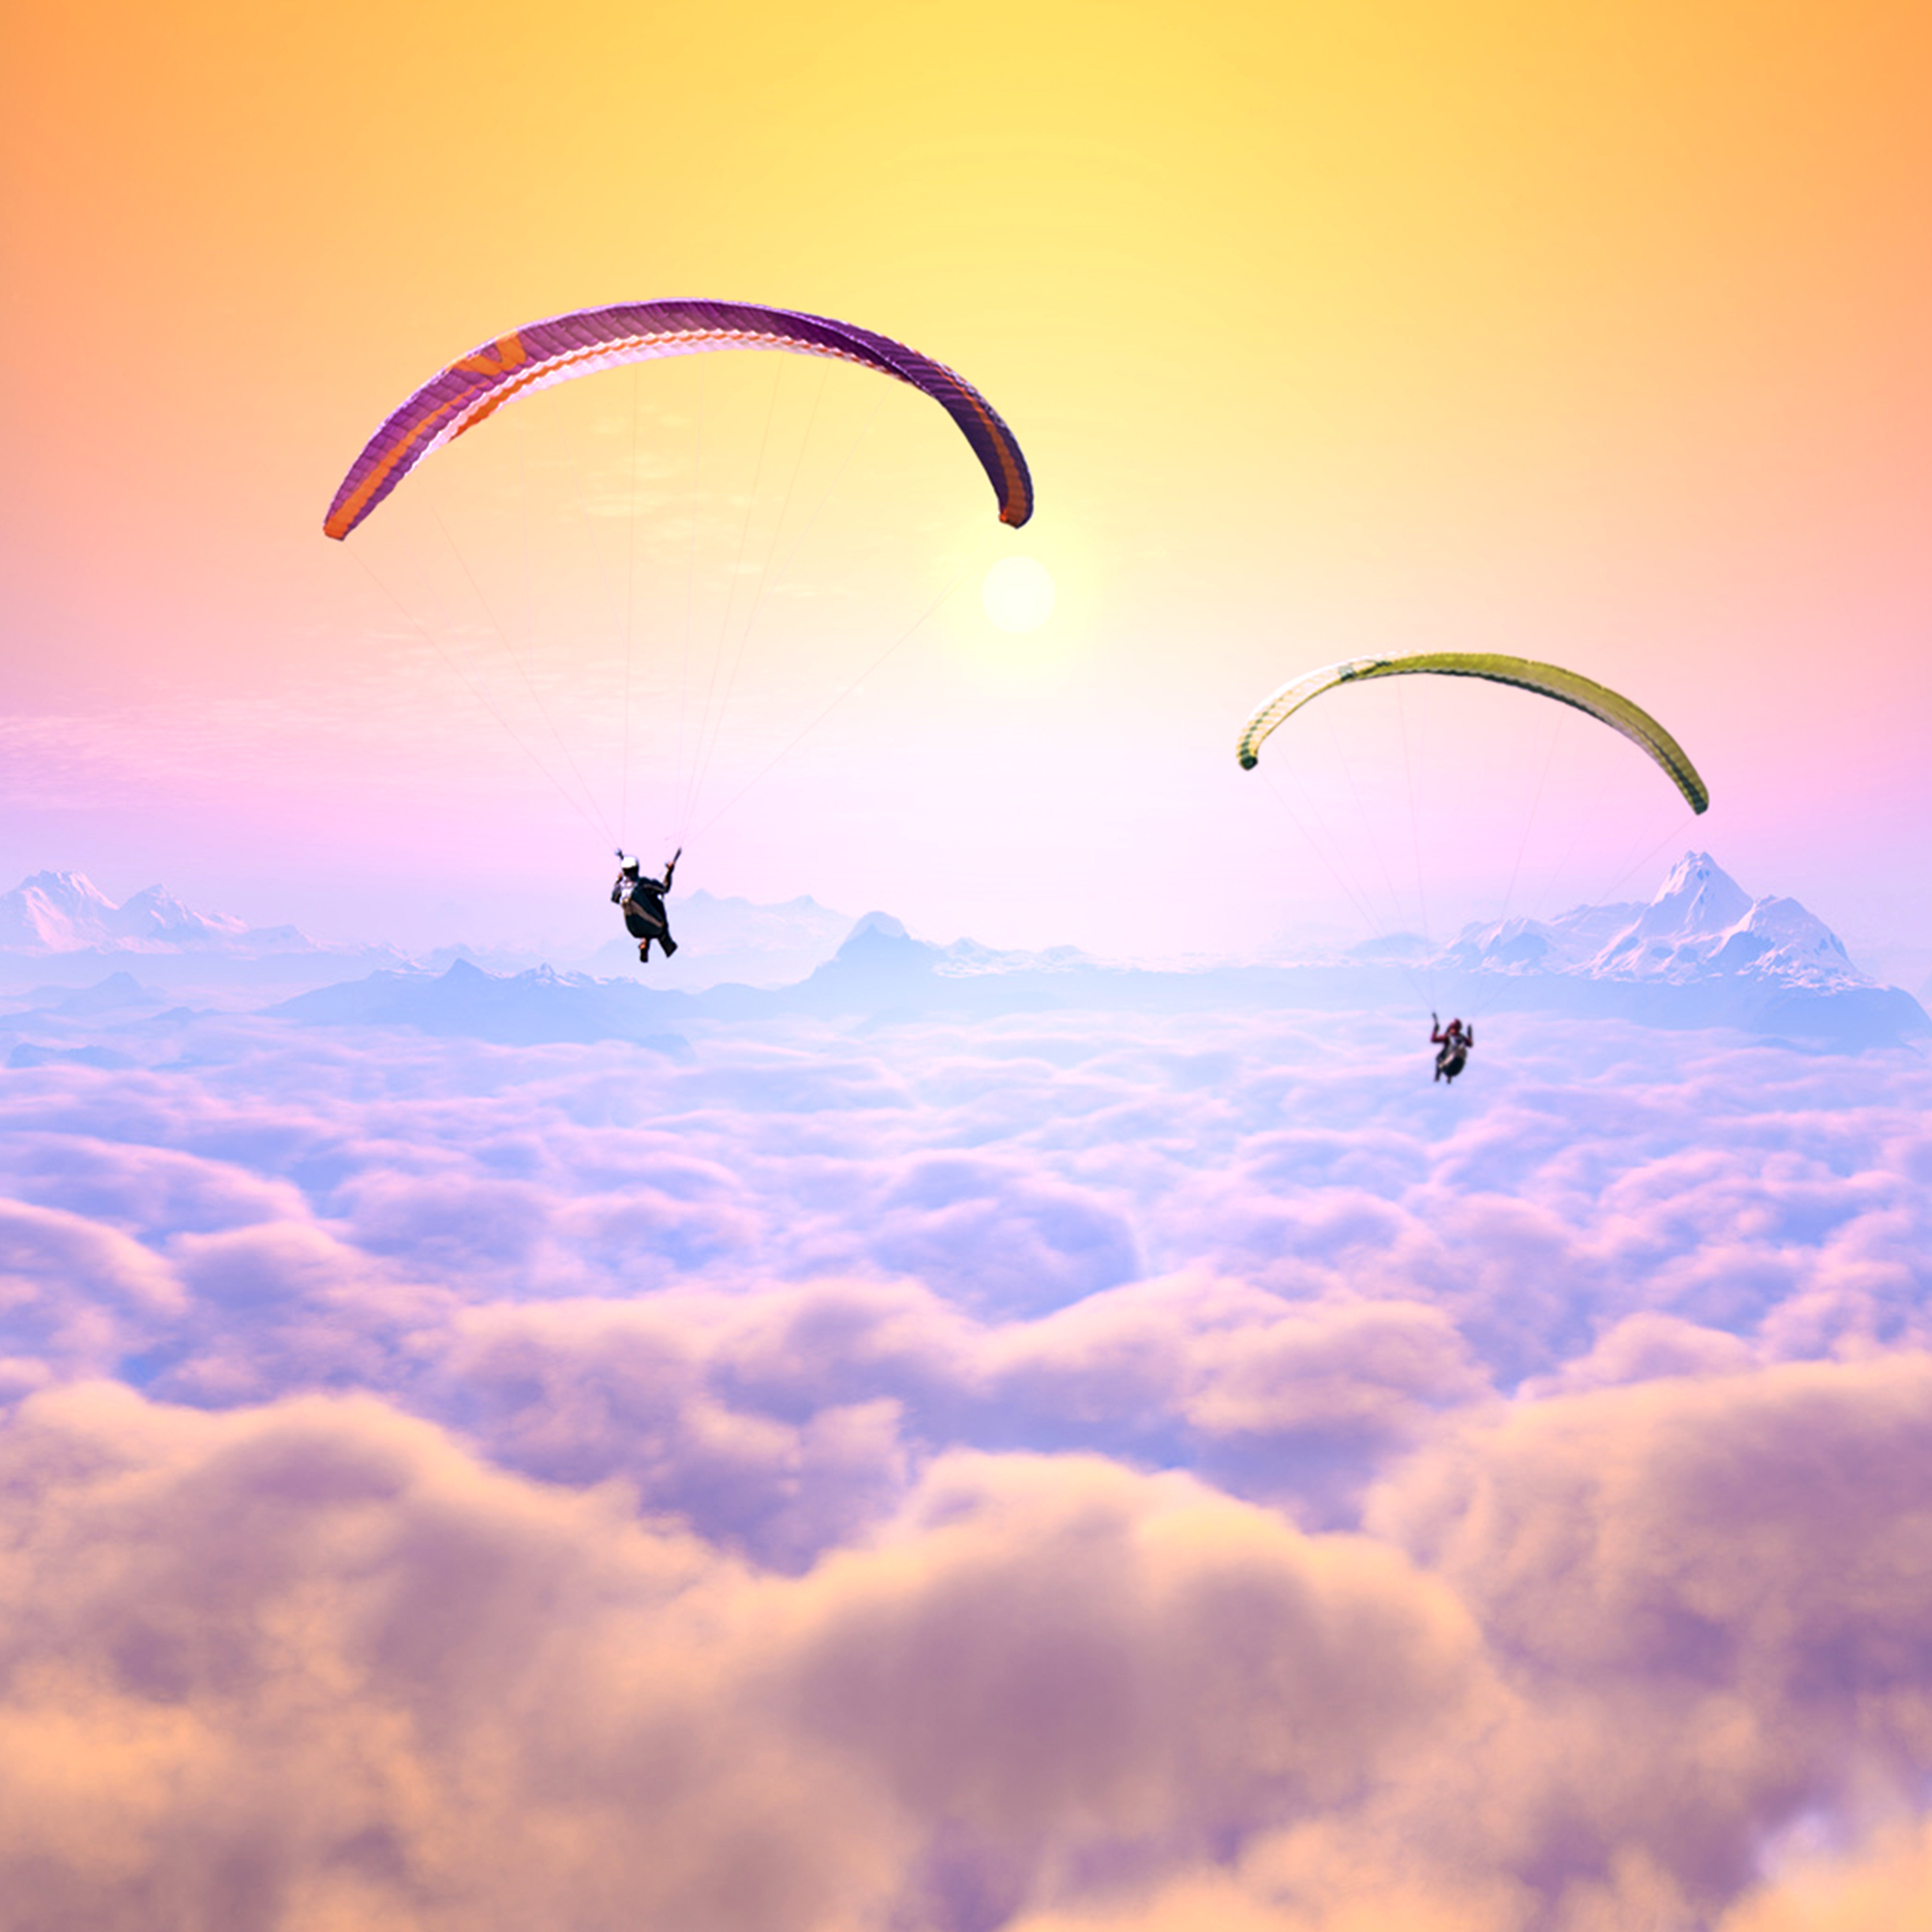 Romantischer Fallschirmsprung durch Wolke 7 - 5